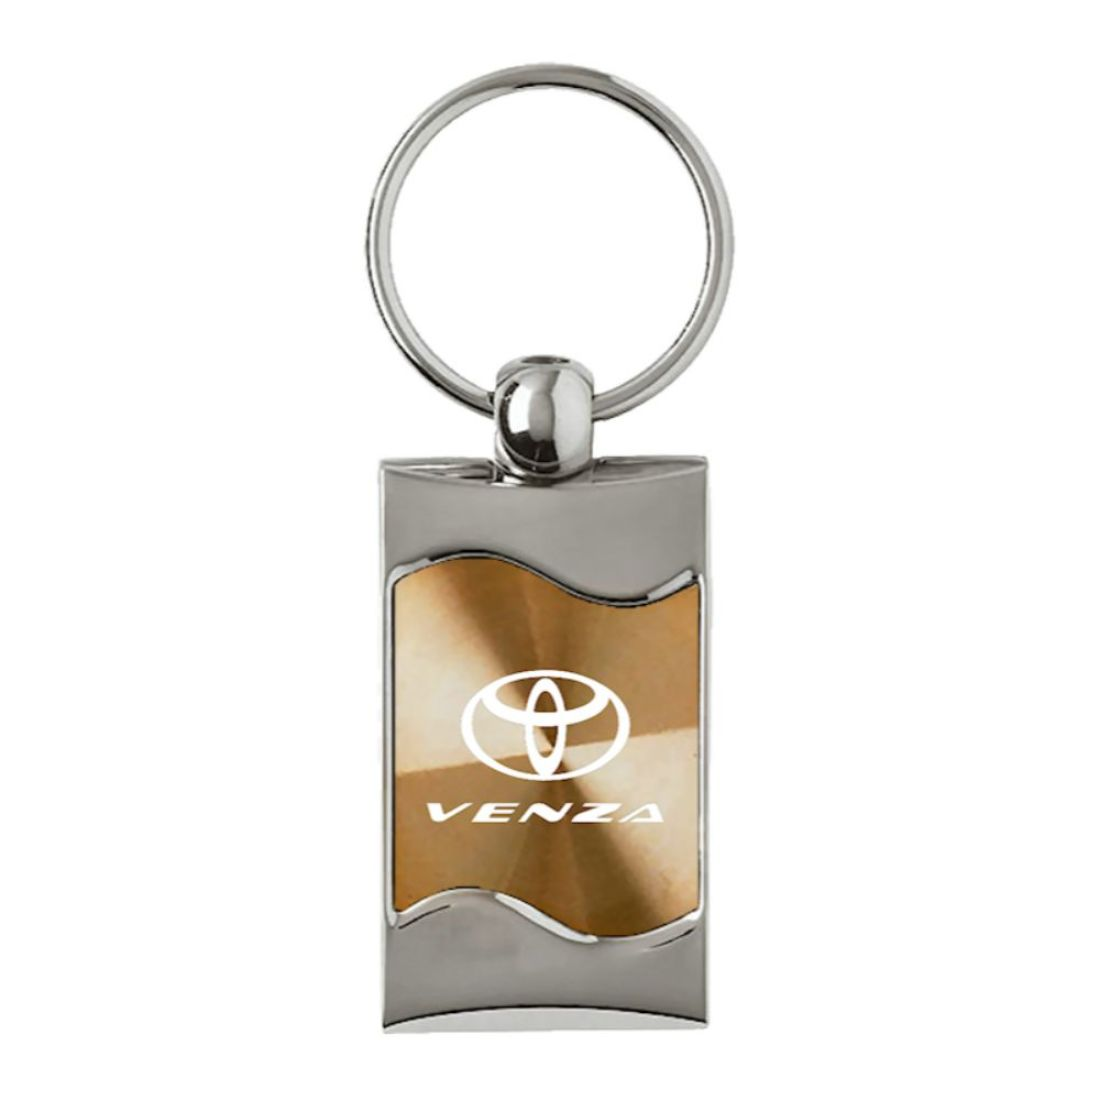 Toyota Venza Black Leather Key Chain Au-TOMOTIVE GOLD